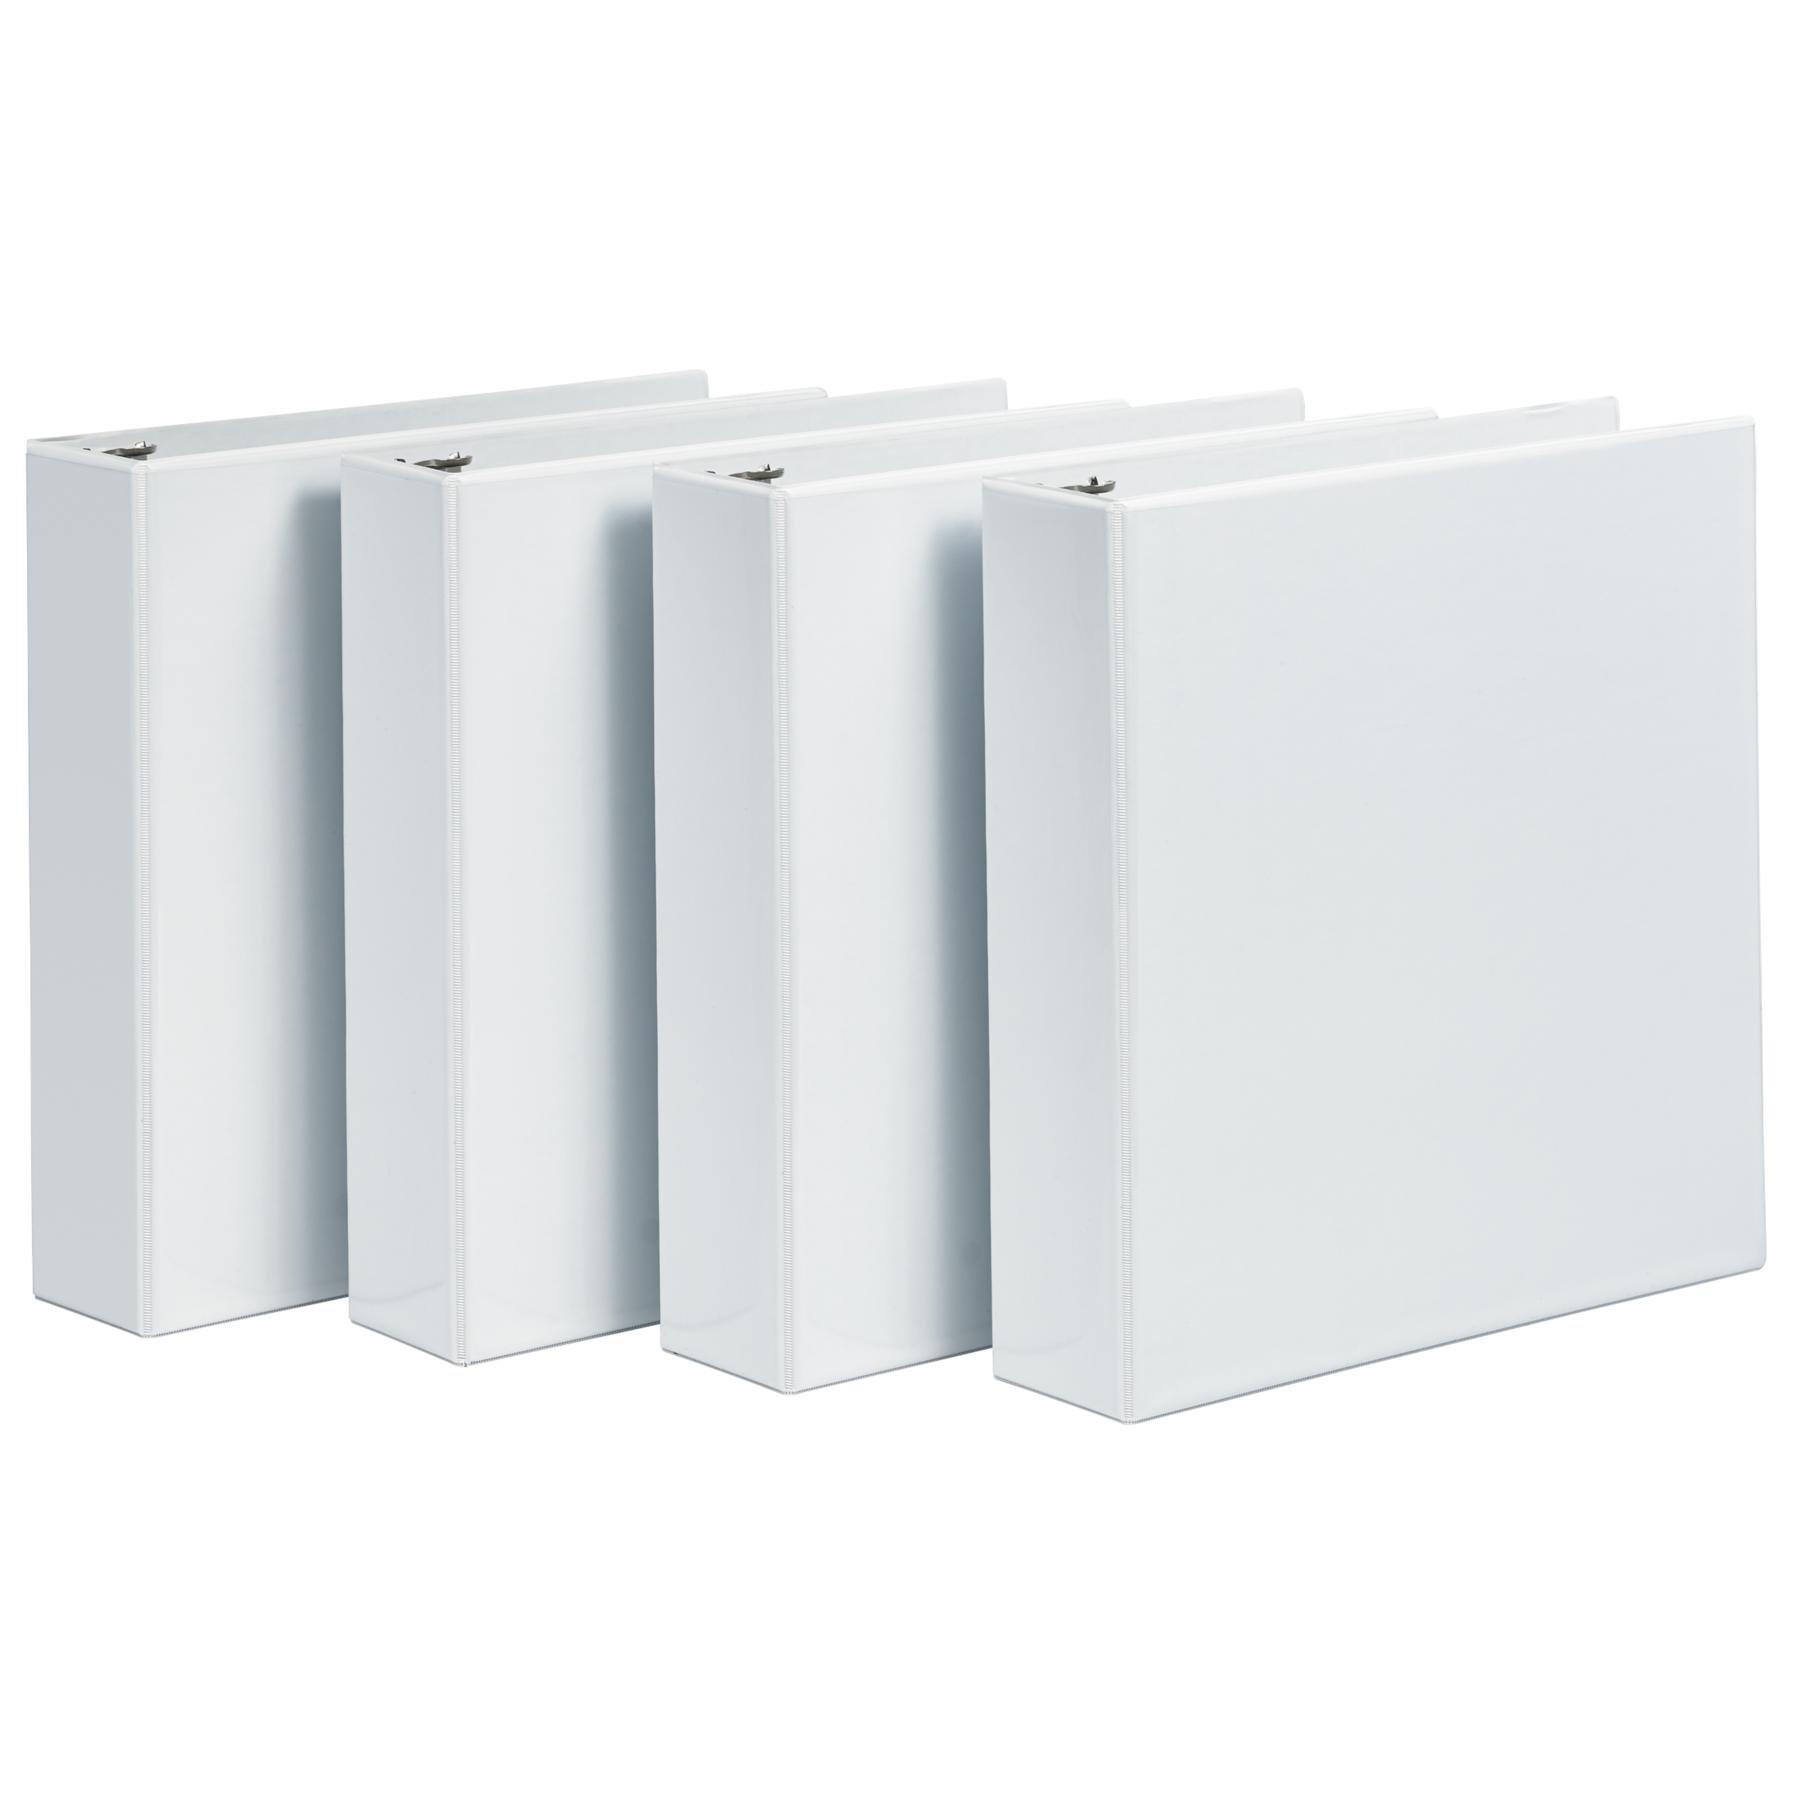 Avery Economy View Binders, 3'' Round Rings, 460-Sheet Capacity, White, Multi Pack of 4 (03360)